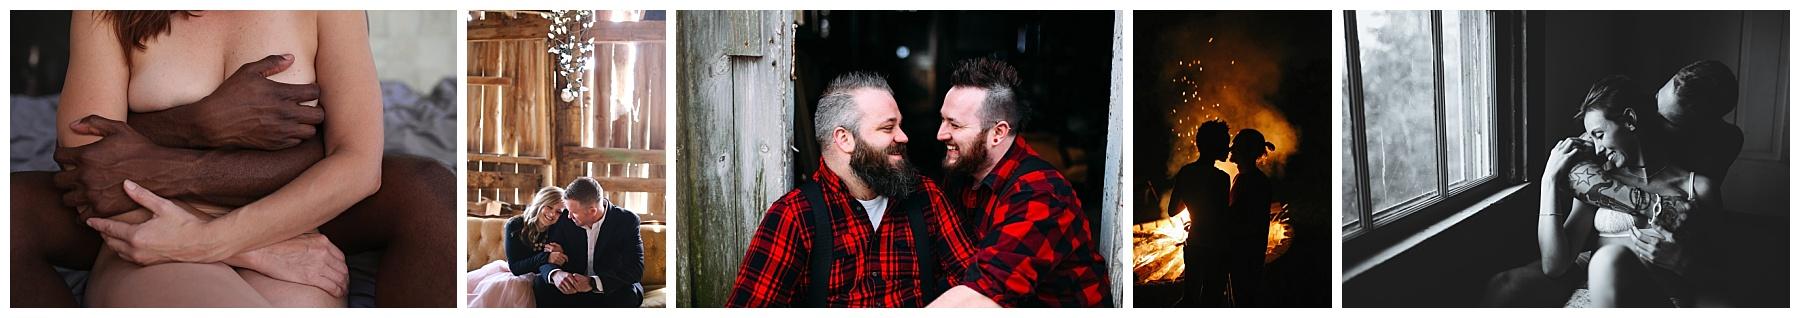 couples boudoir | gay couples boudoir| naked photos| Indiana boudoir